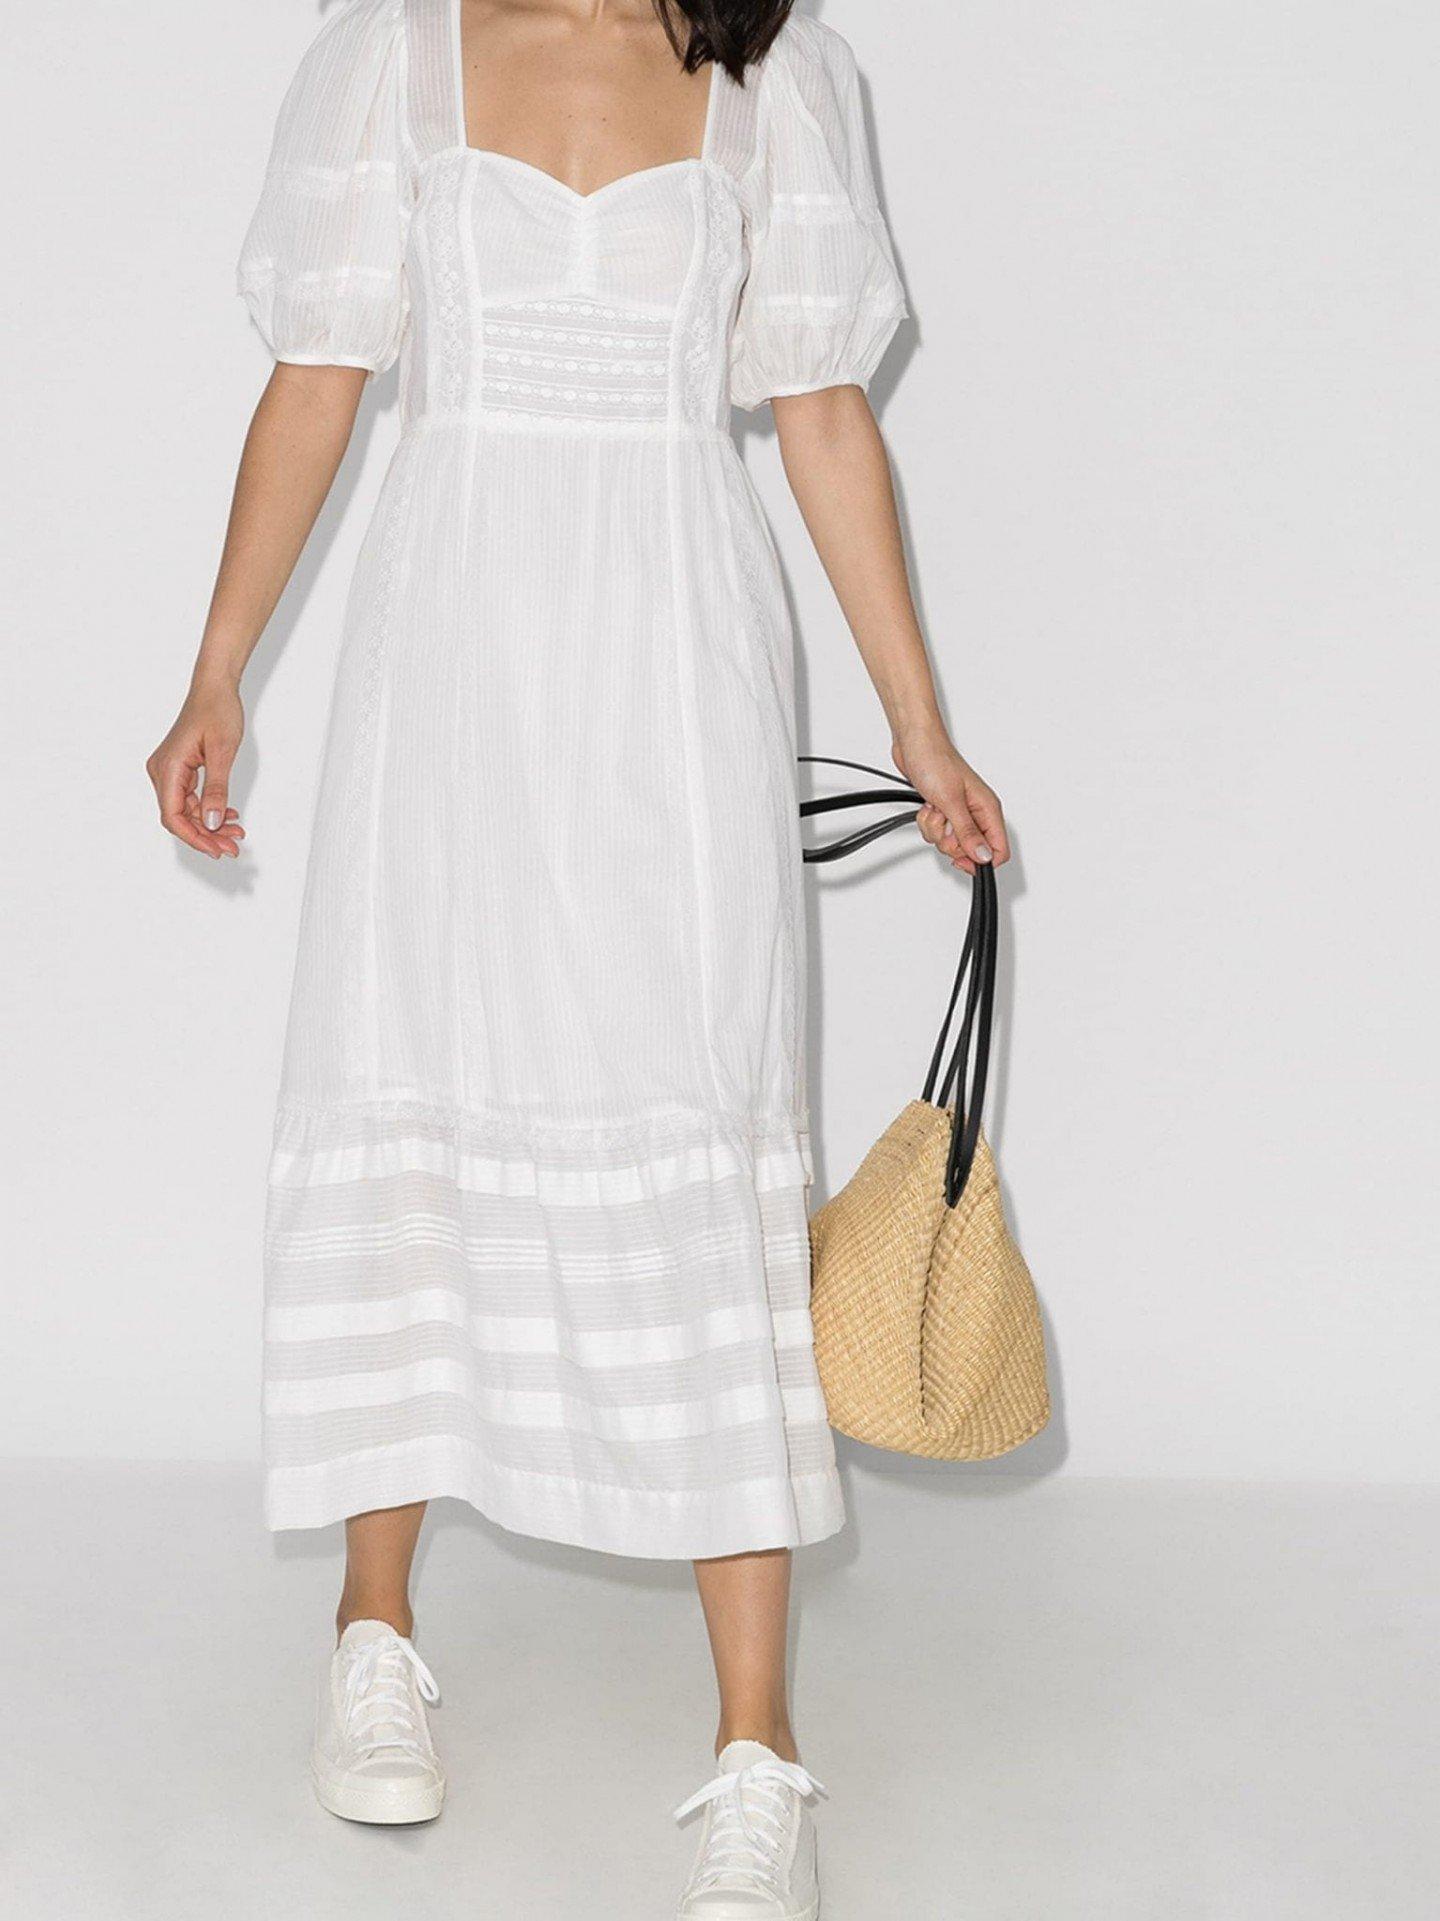 REFORMATION Norwich Lace Trim Cotton Midi Dress